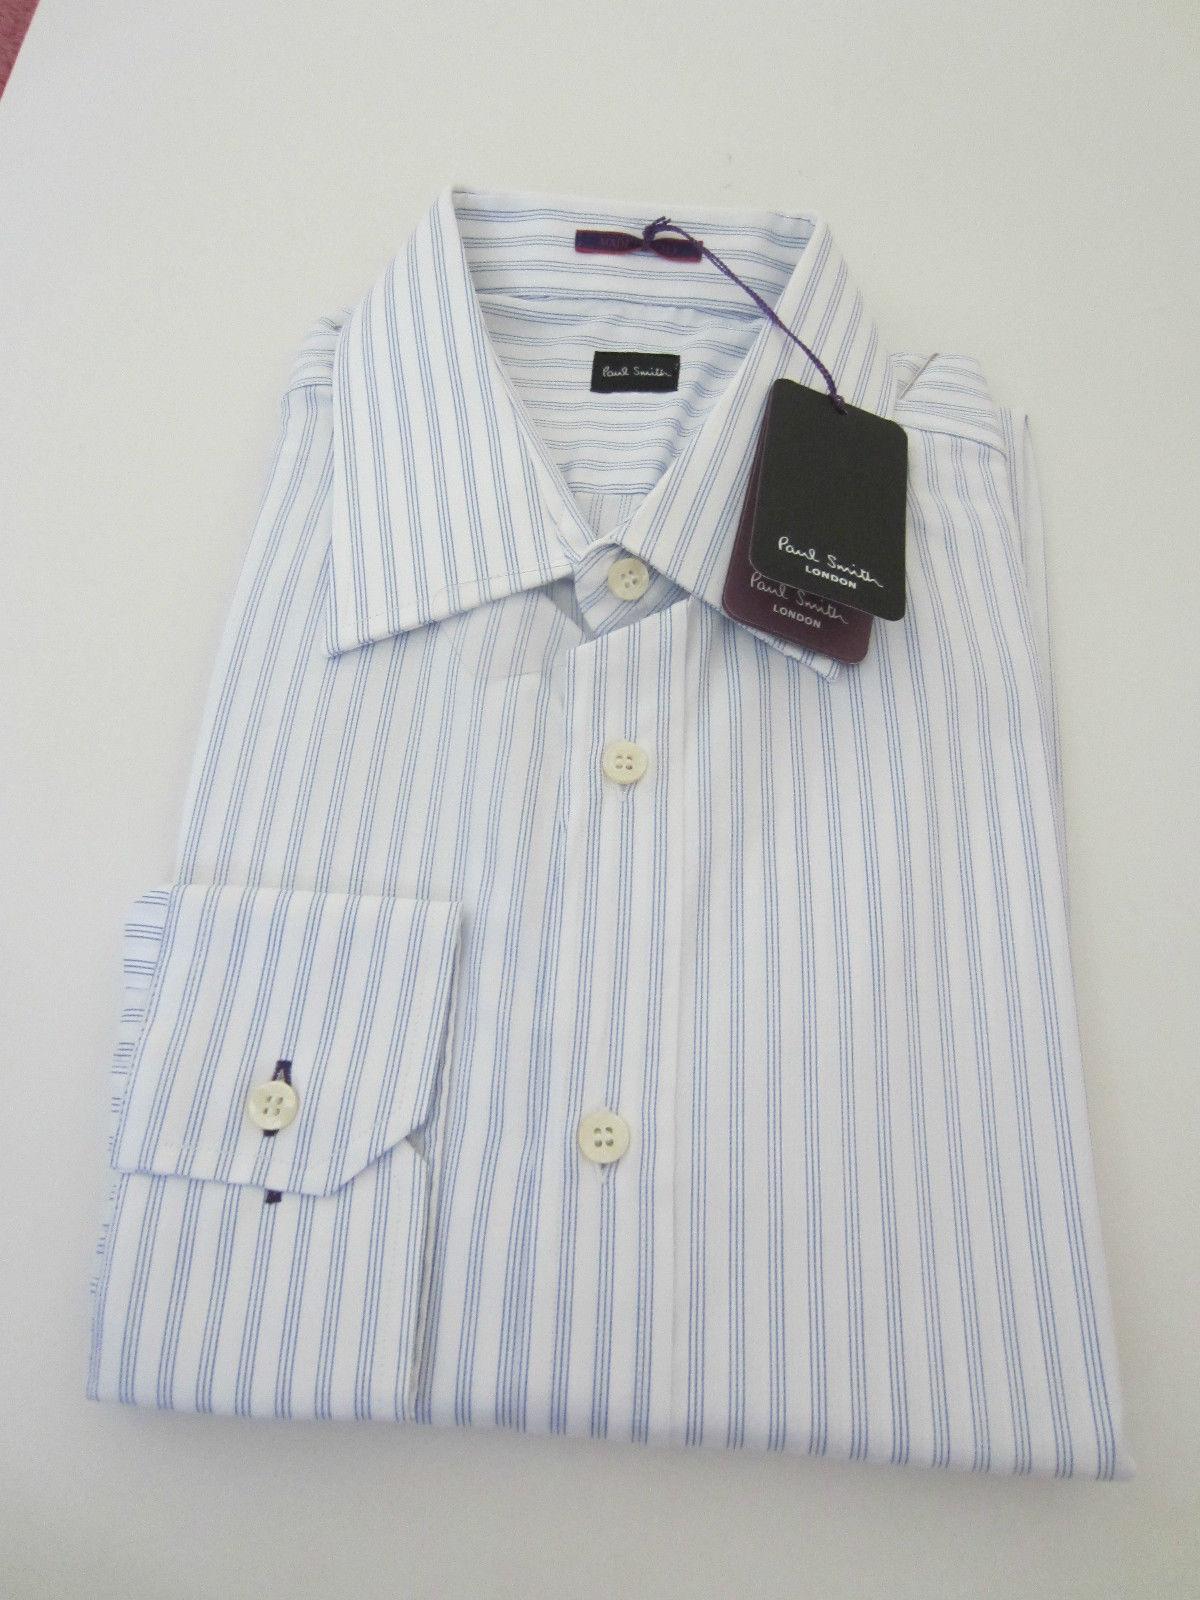 Paul Smith LONDON LS Shirt bluee stripes - Size 16.5   42  - p2p 22.5  -